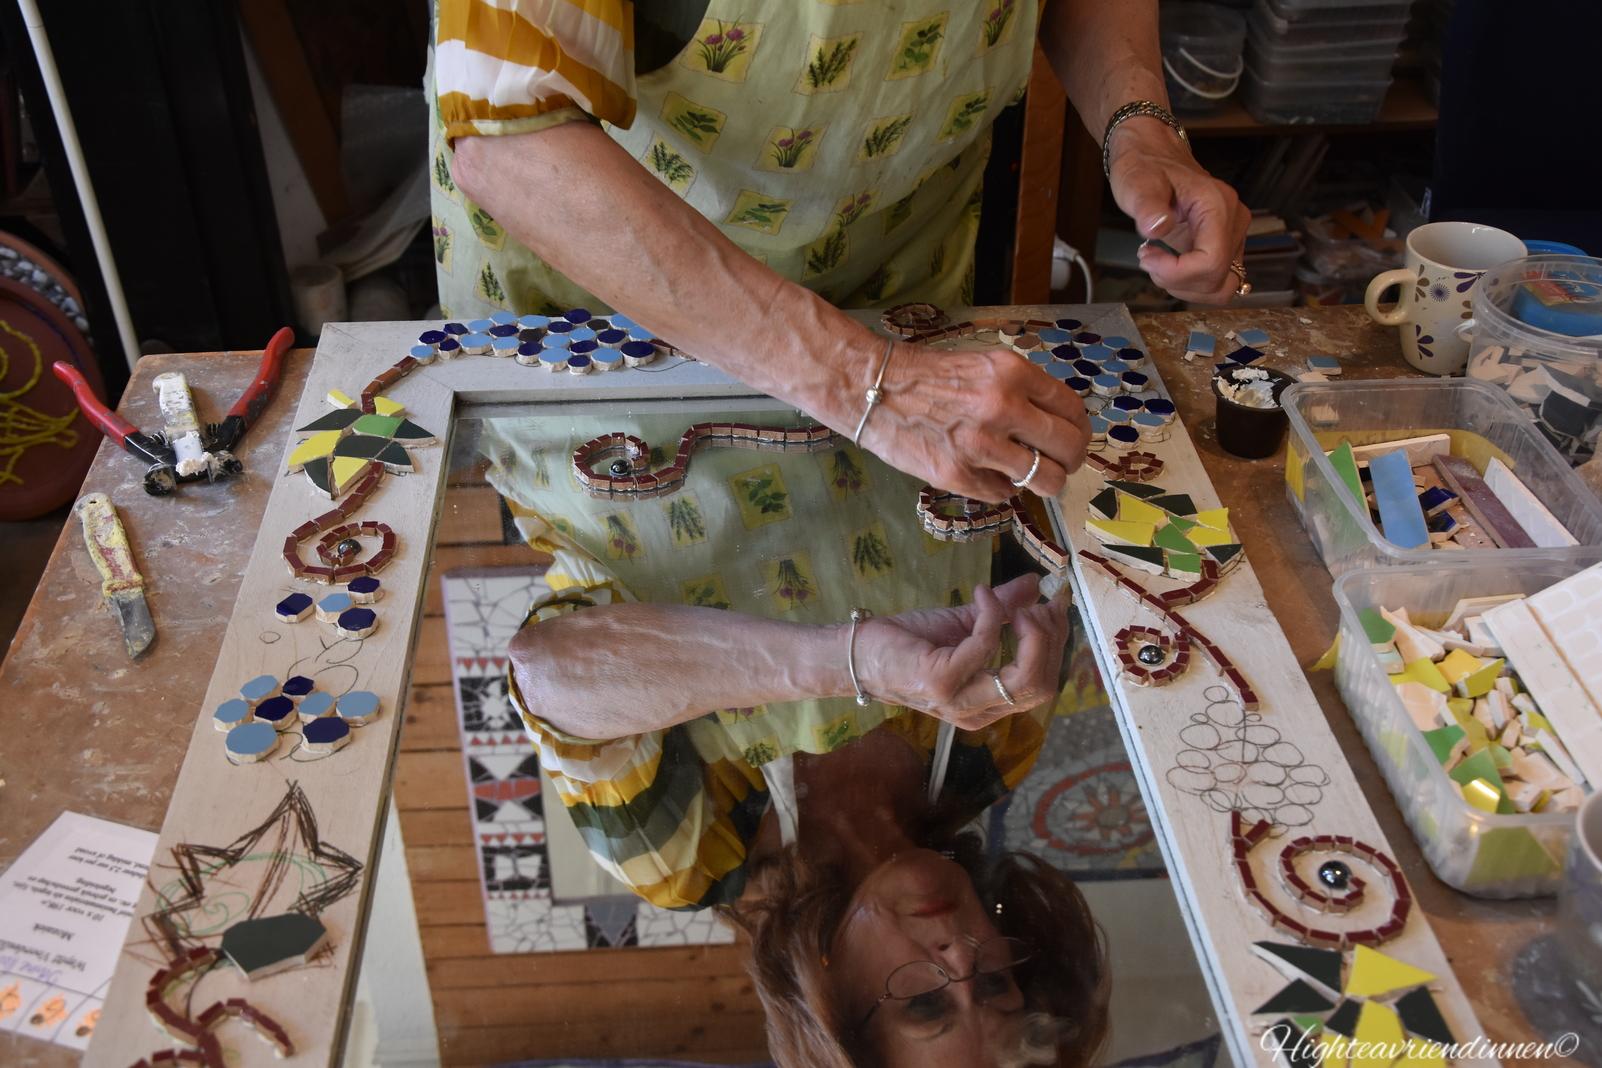 Wapiti, high tea vriendinnen, workshops, den haag